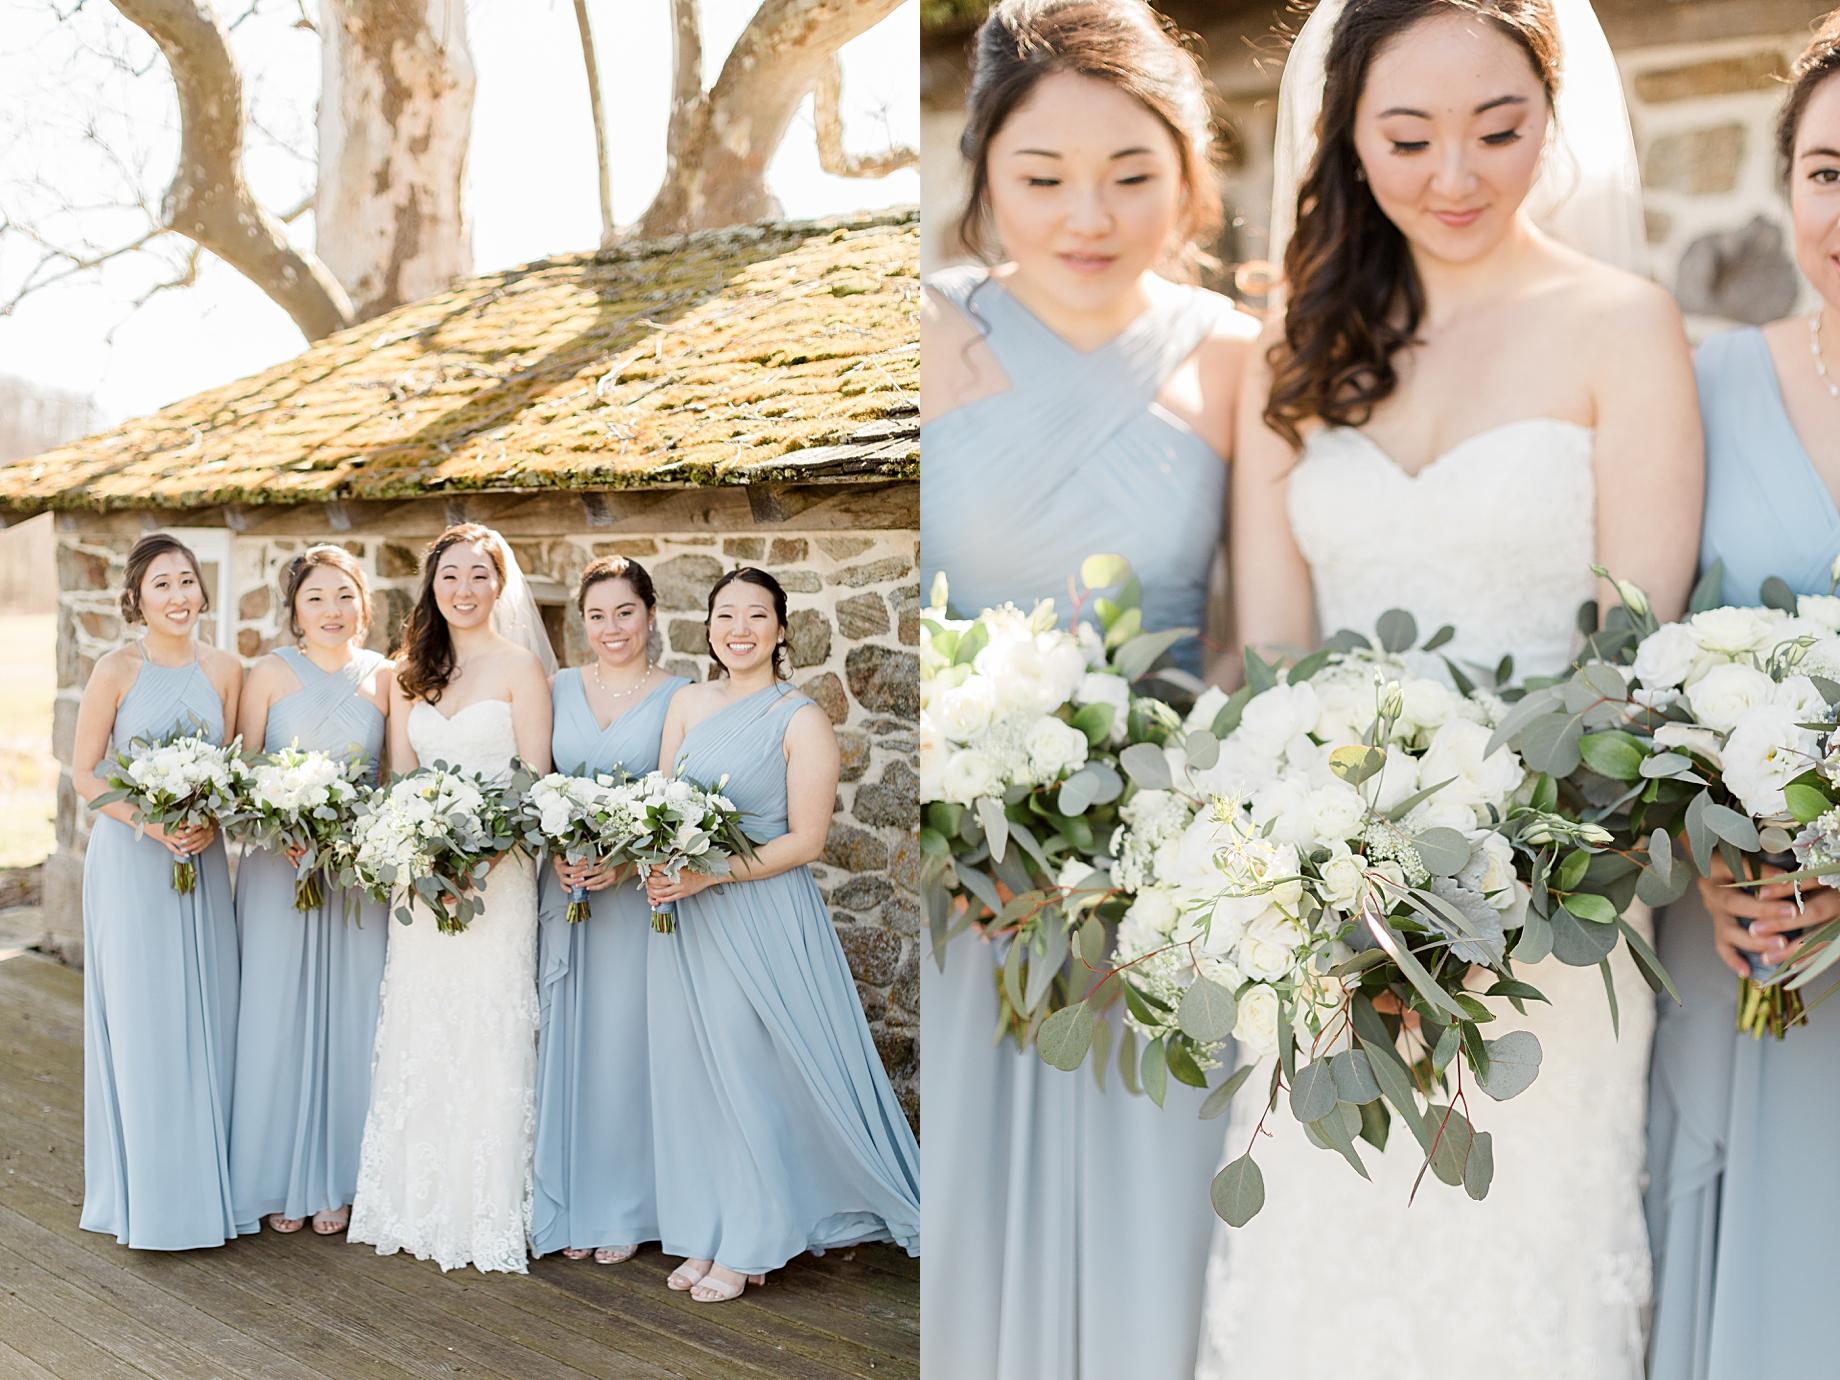 Elegant Winter Wedding at French Creek Golf Club | Bridesmaid Dresses from Azazie